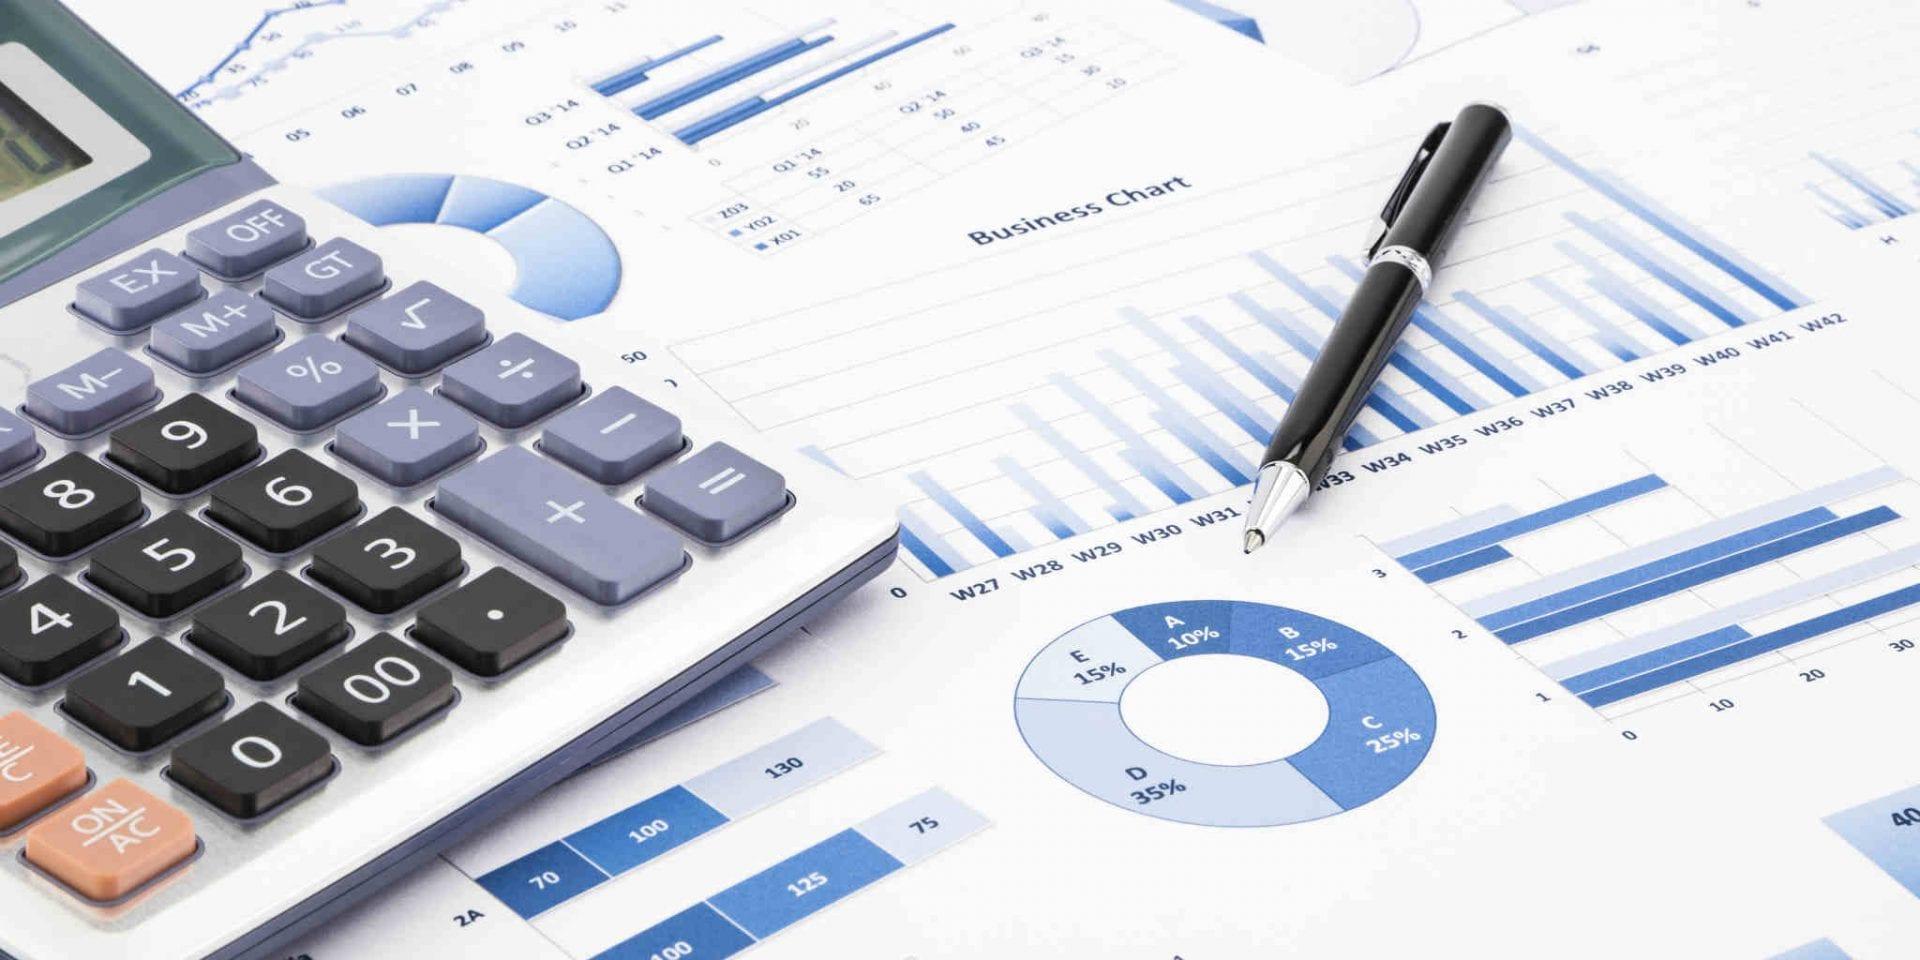 analise financeira 1